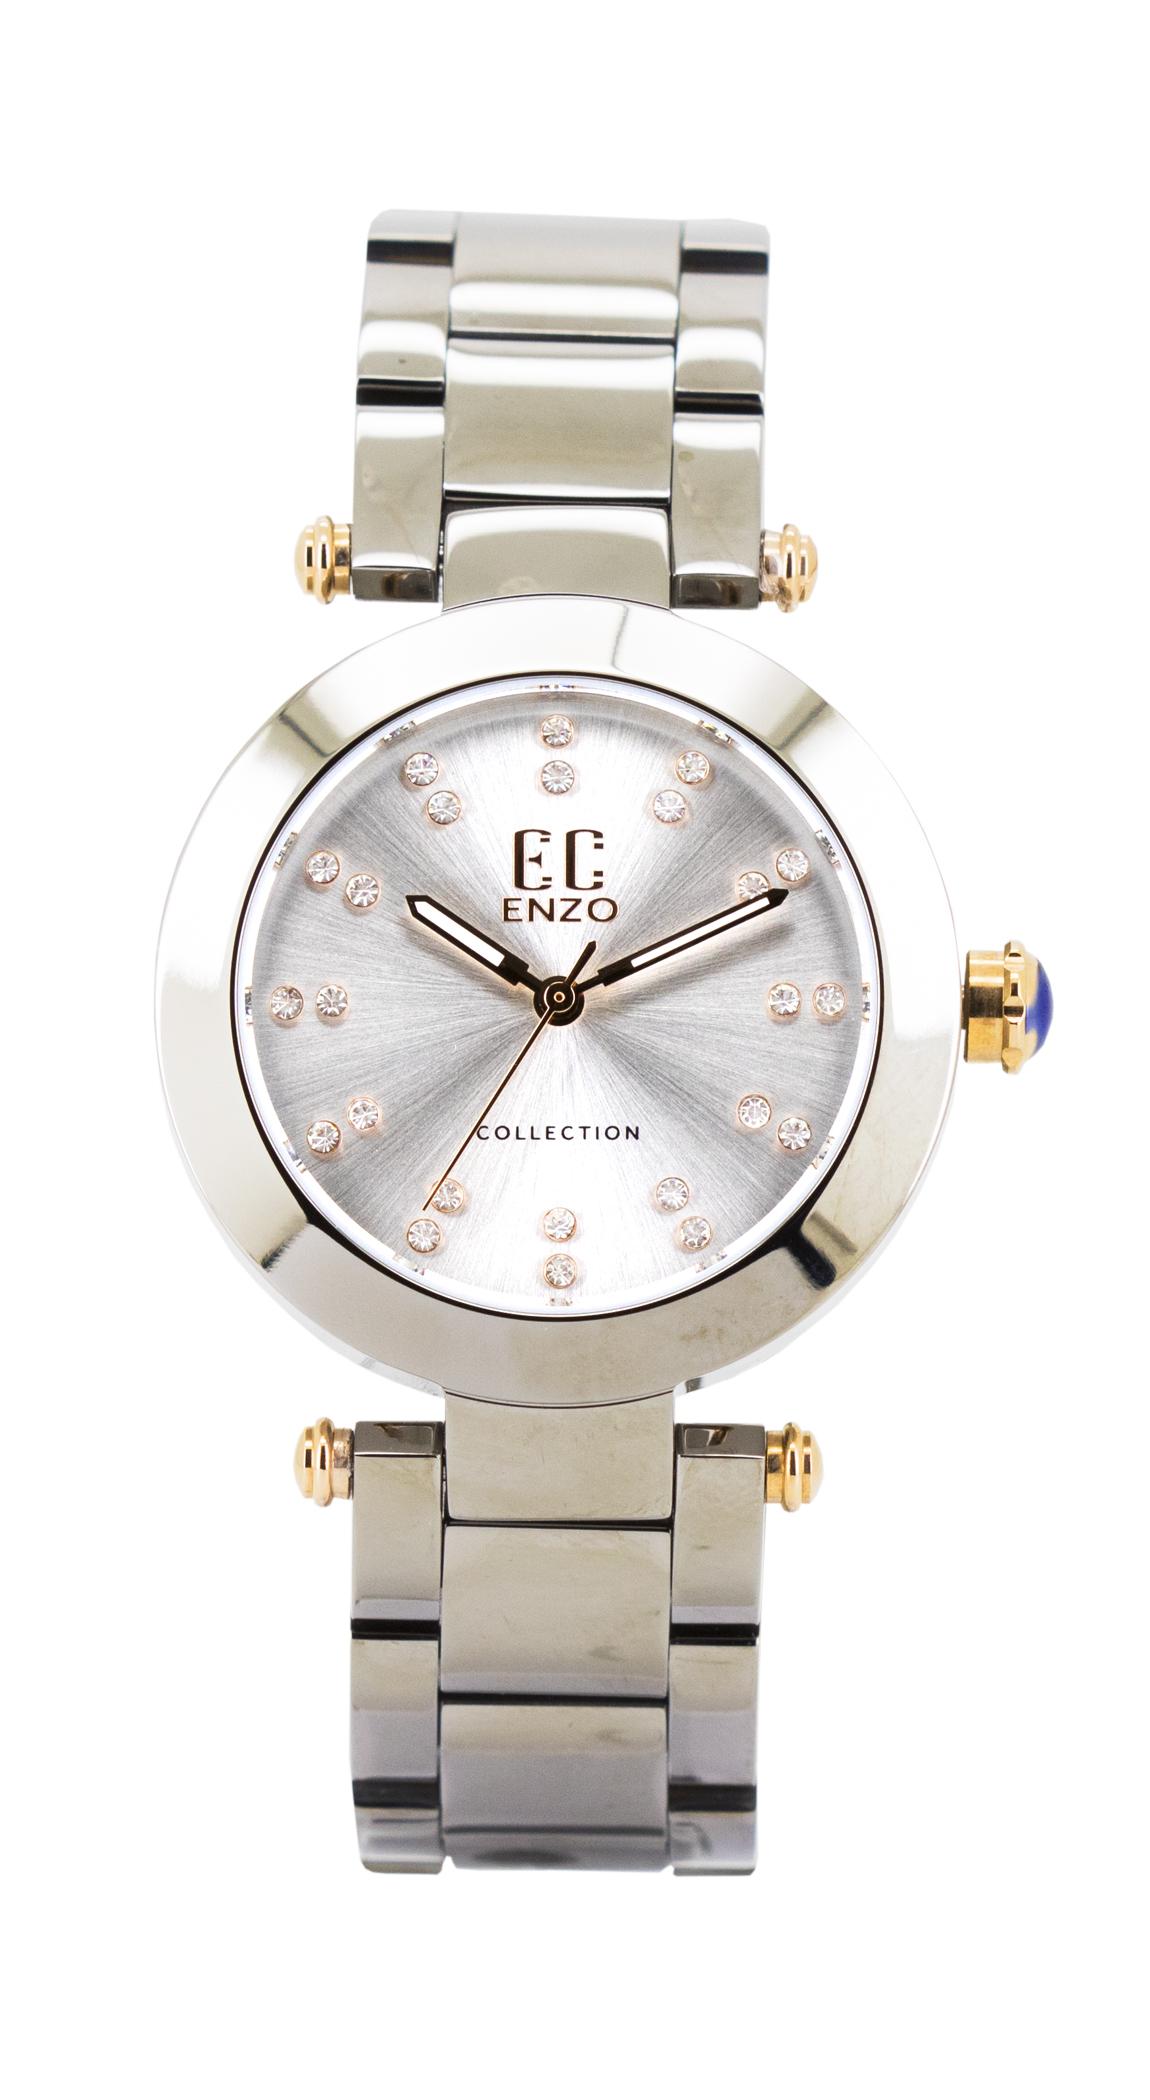 EC#0717# – Enzo Collection